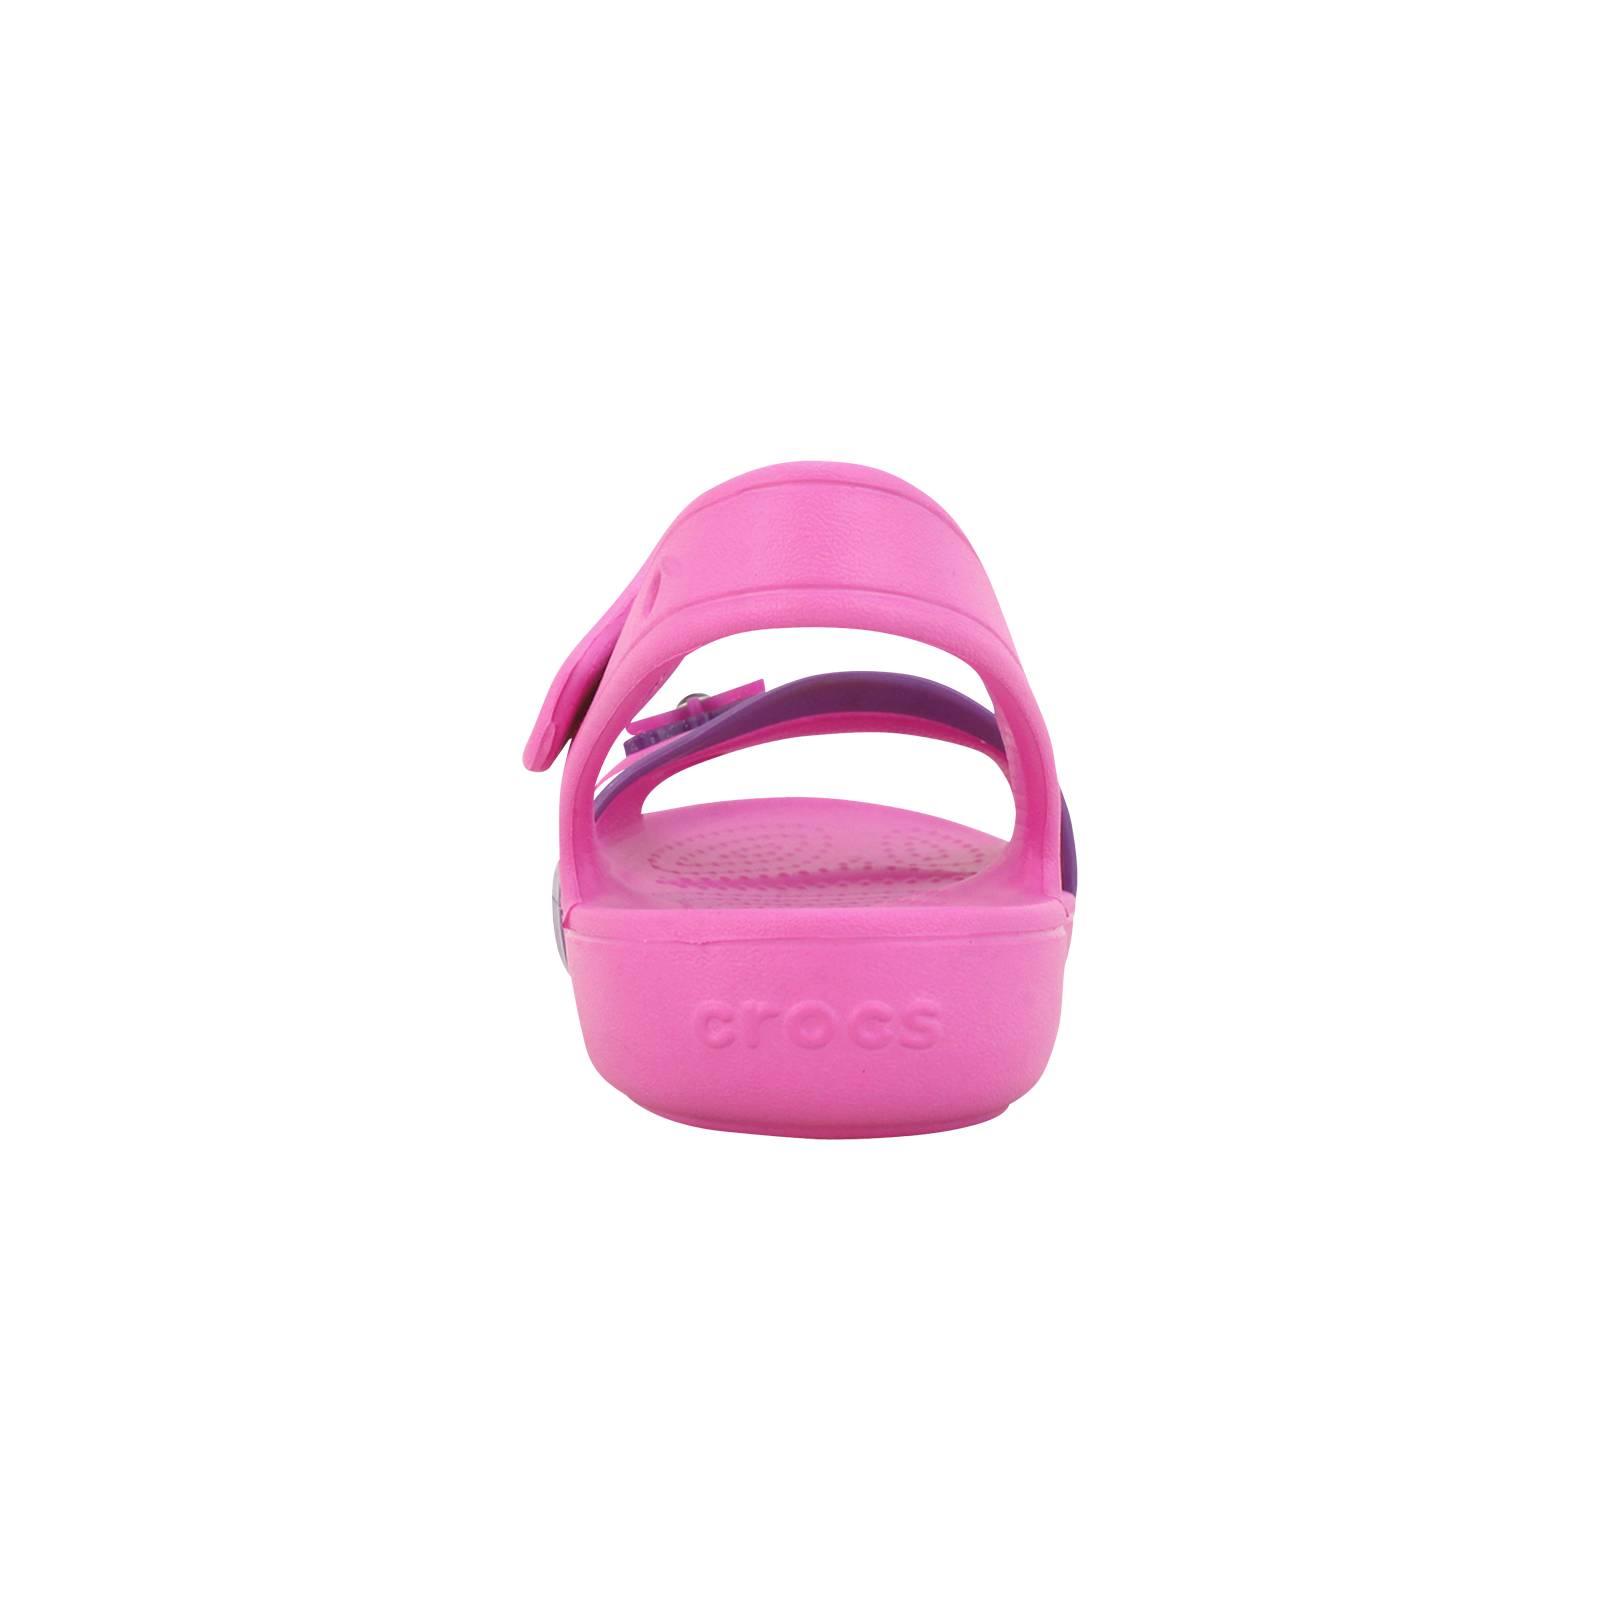 eff916b8554b Lina Sandal - Crocs Kids  sandals made of croslite - Gianna Kazakou ...